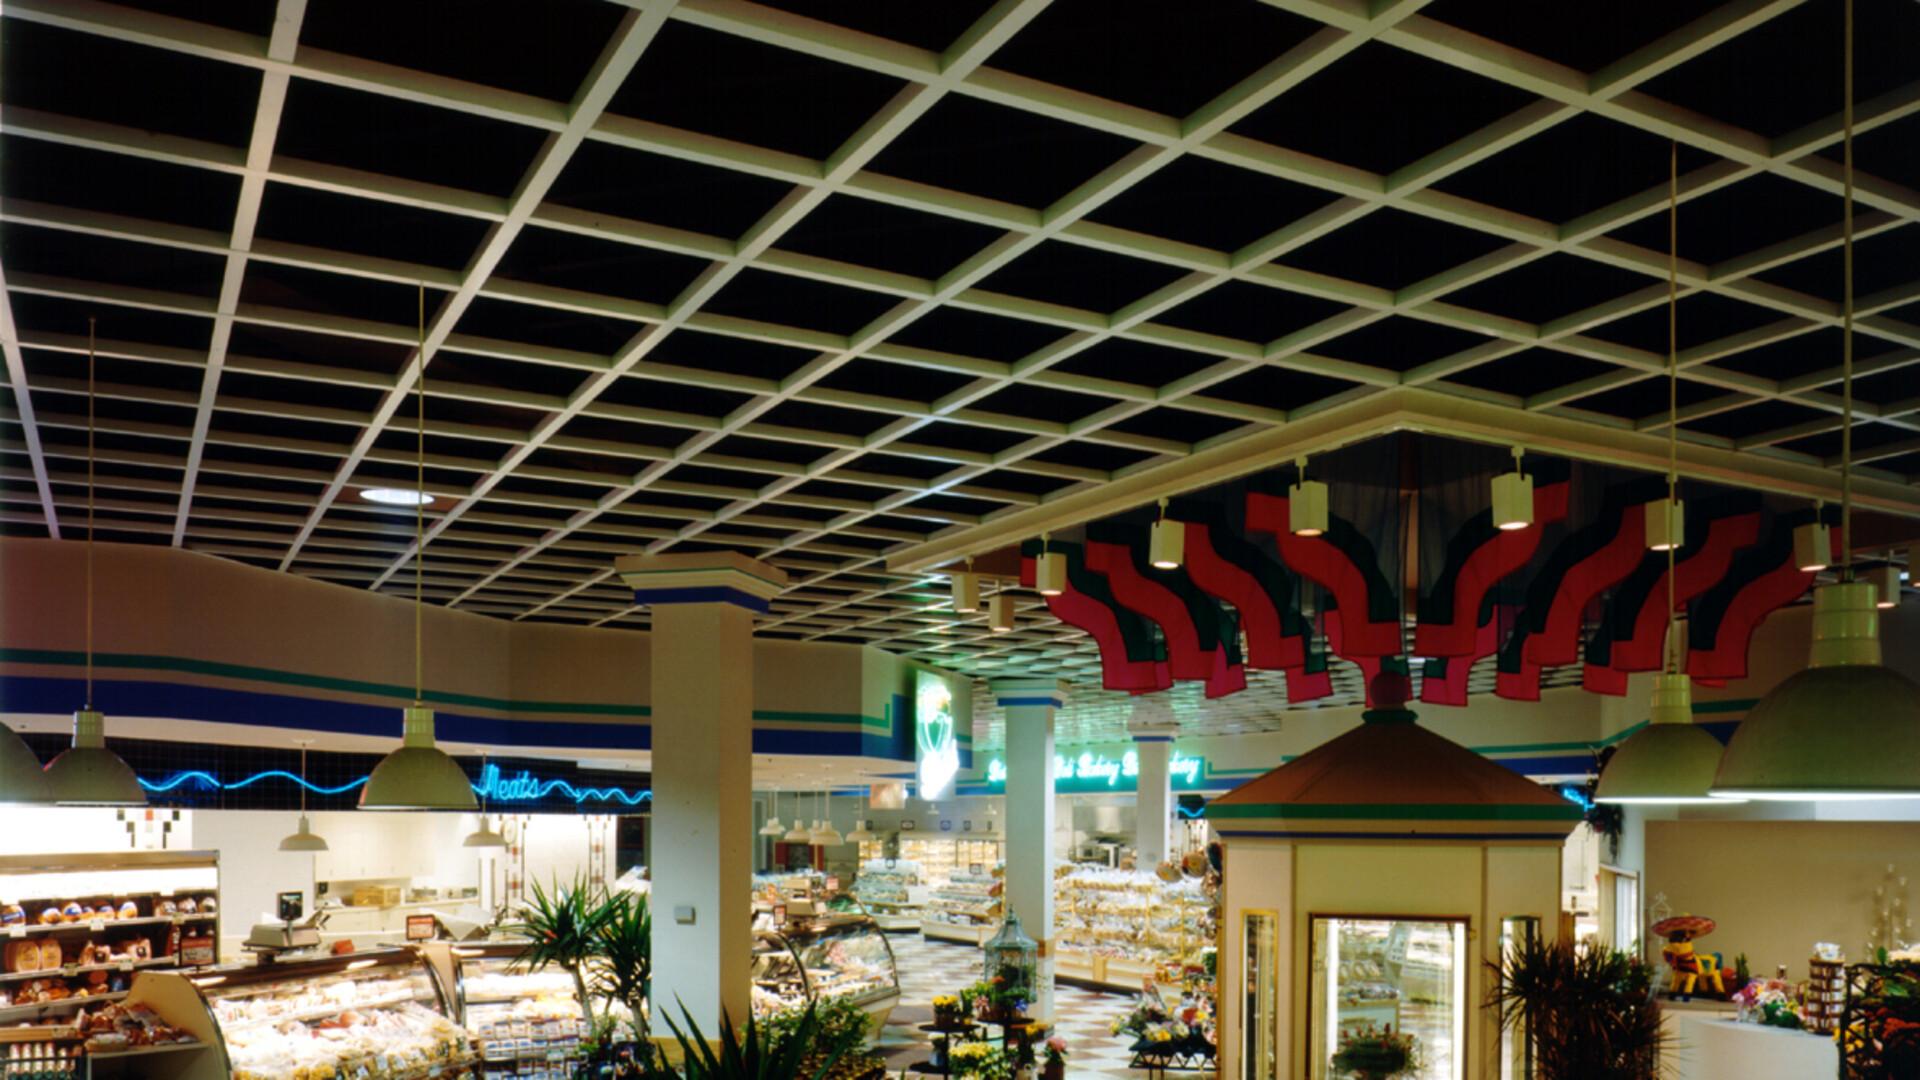 BeamGrid, Grocery Store, metal ceilings, website photography